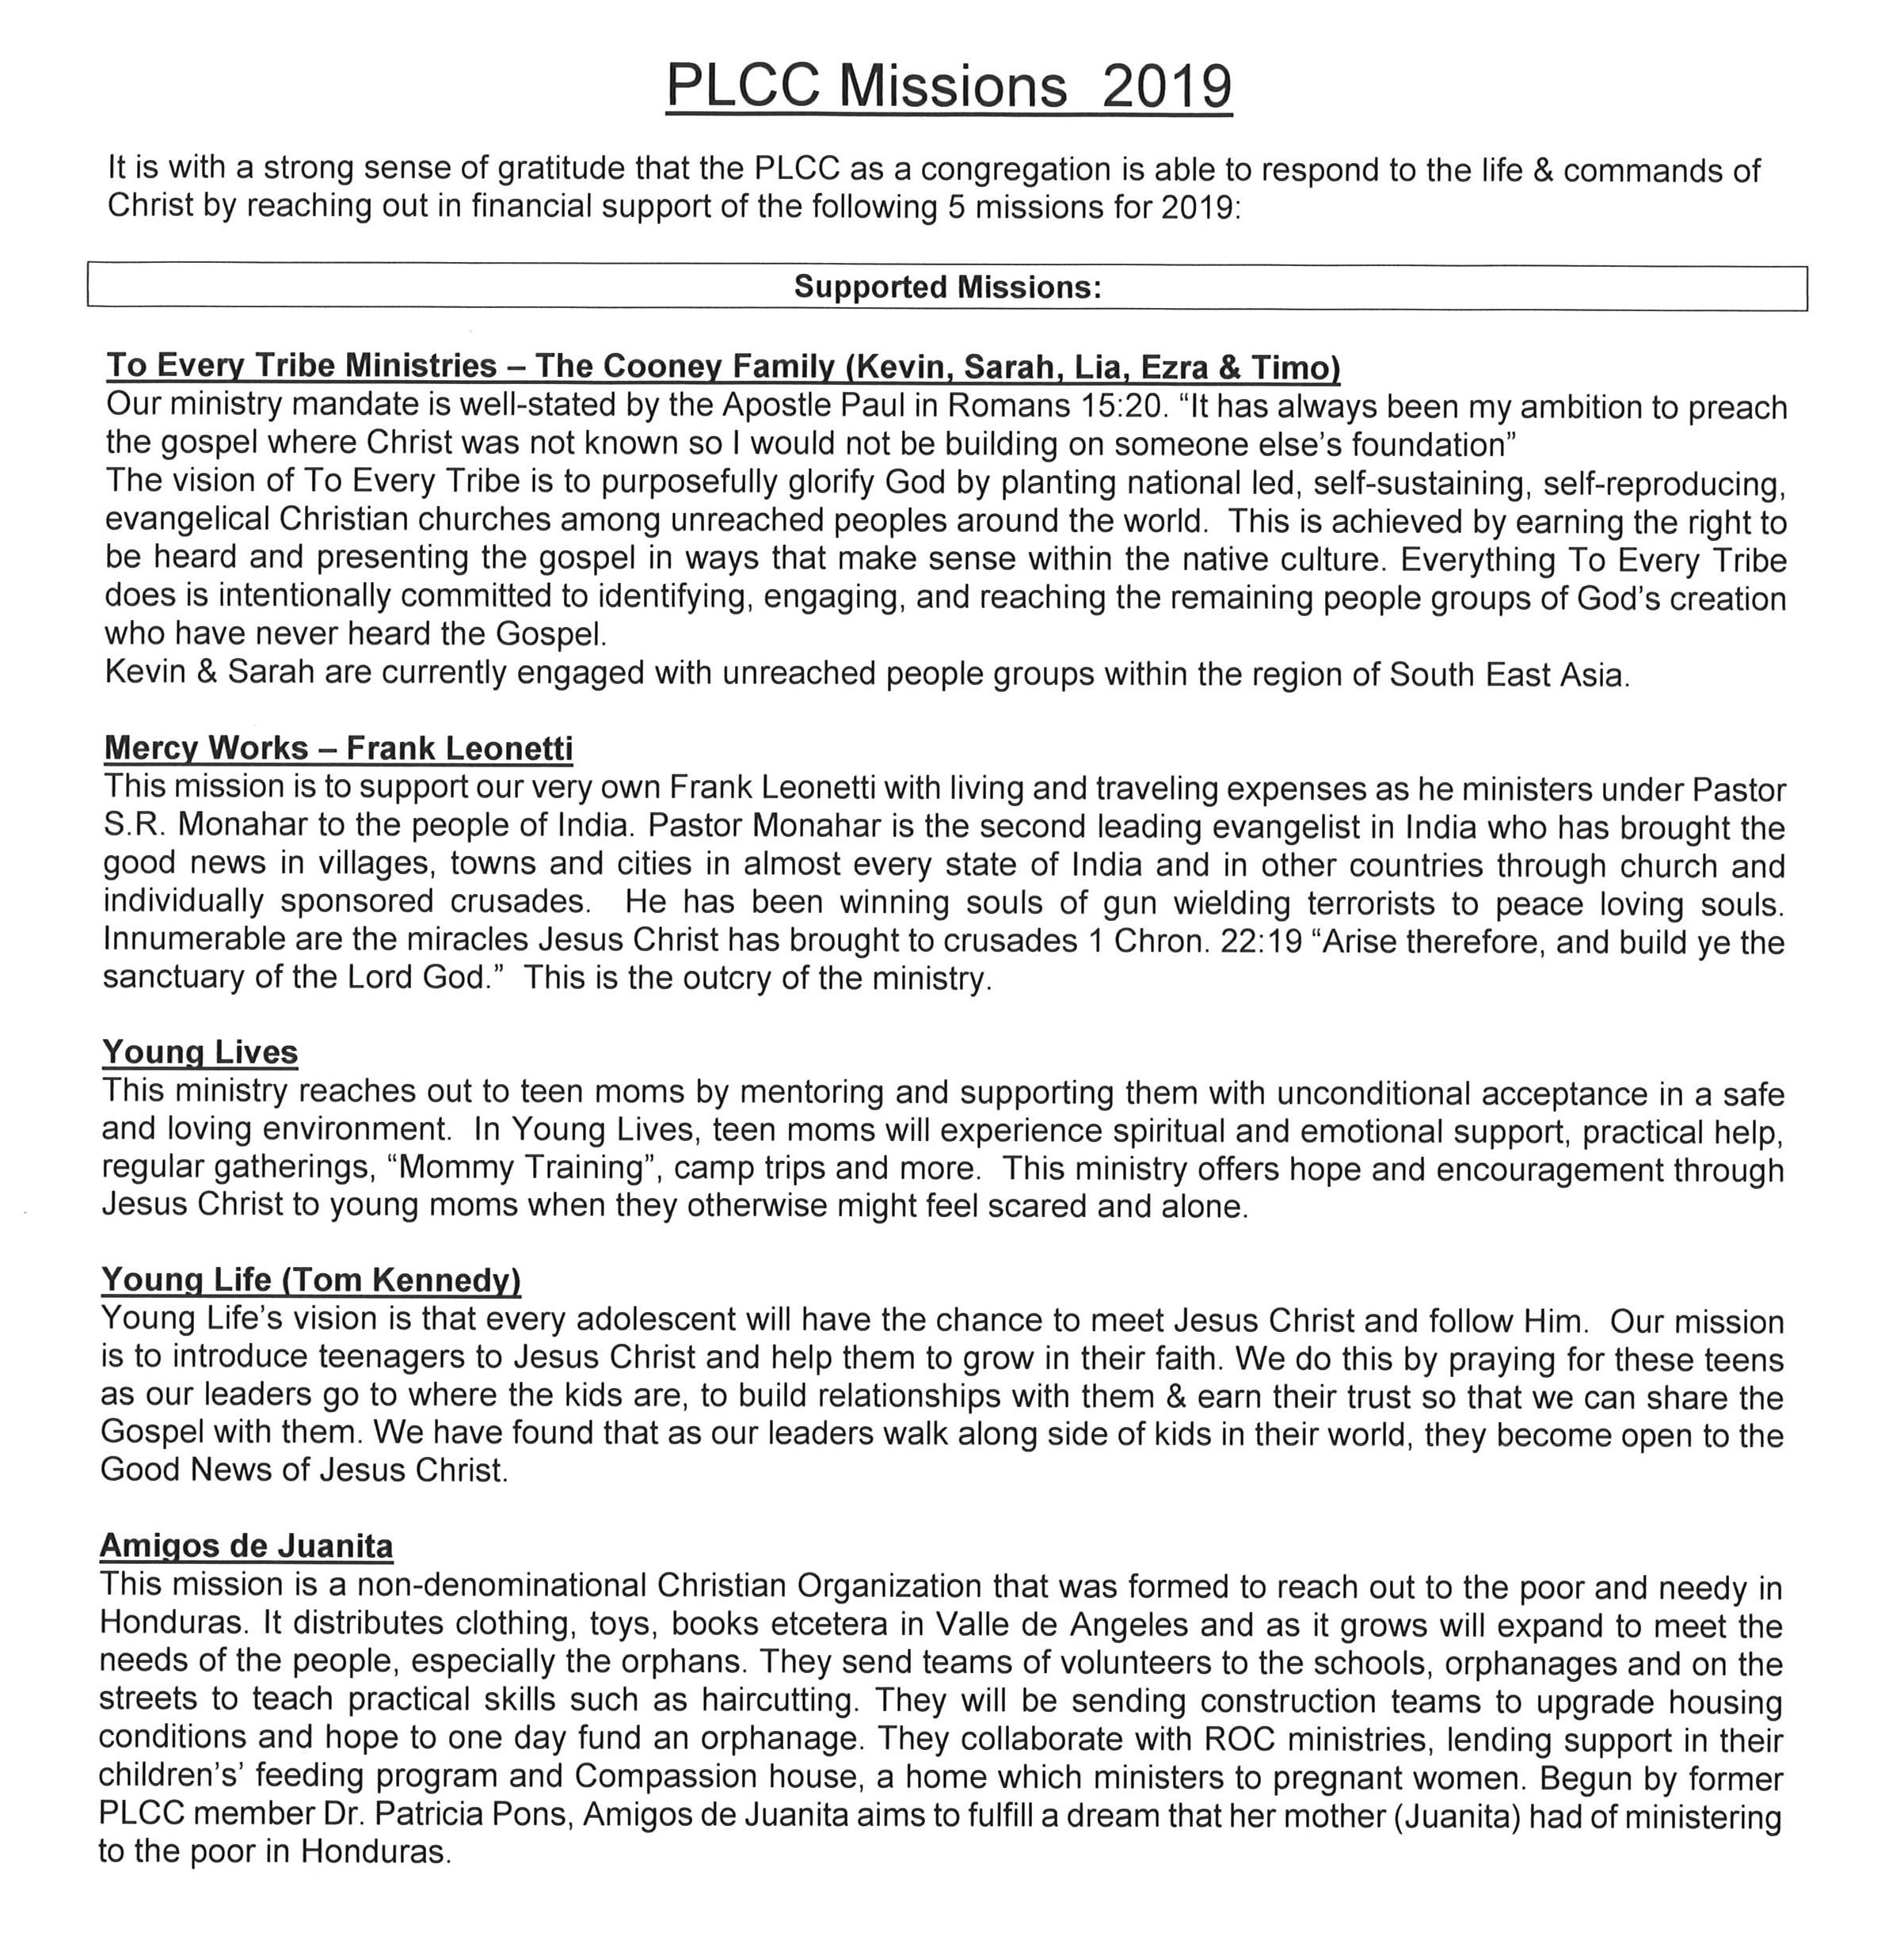 PLCC 2019 Missions